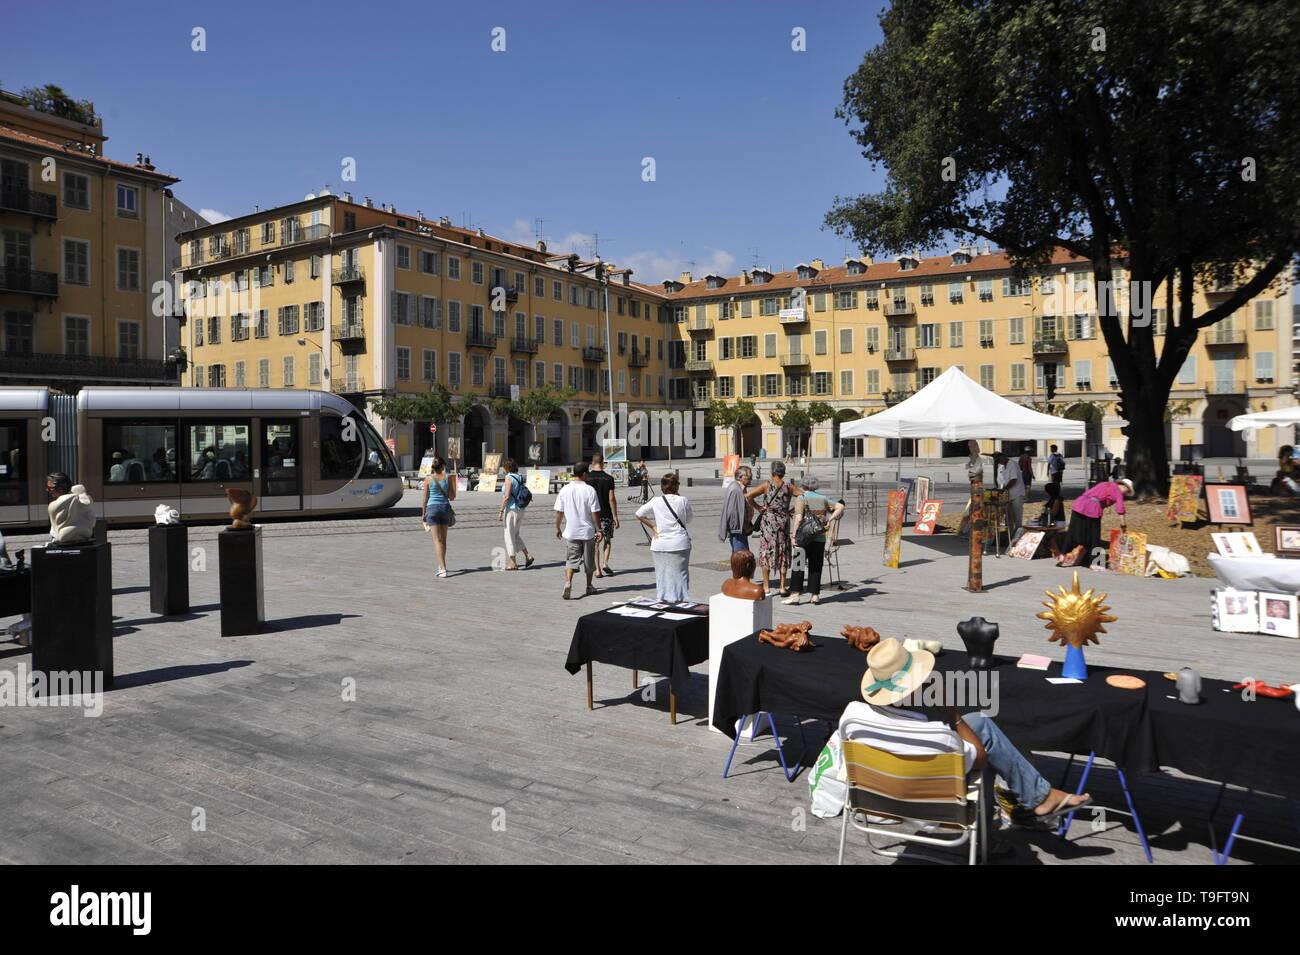 Tramway Nizza, Garibaldi - Stock Image